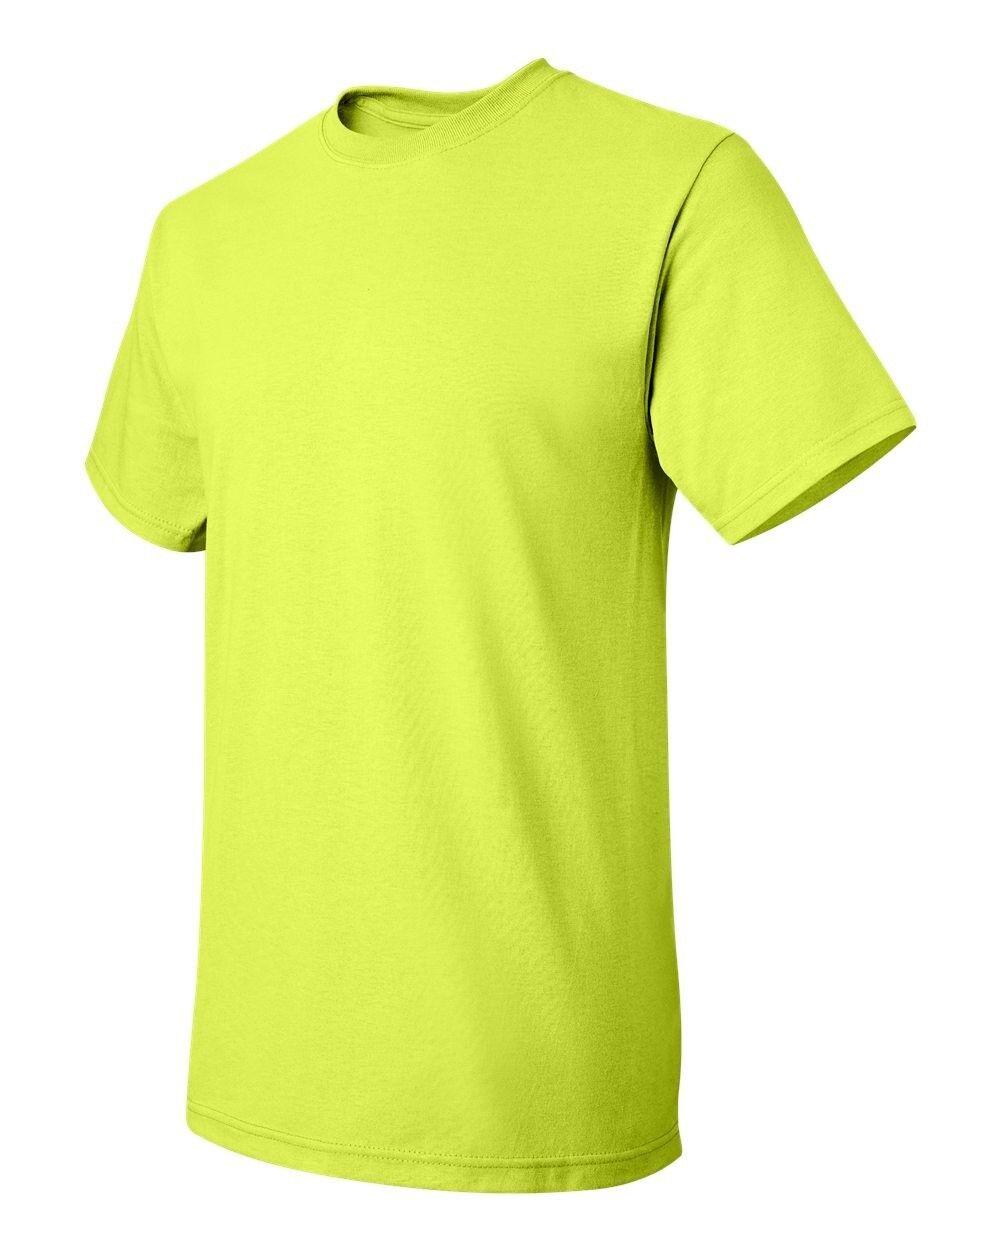 12 NEW Wholesale Hanes TAGLESS 5250 Safety Grün Adult T-Shirts S M L XL